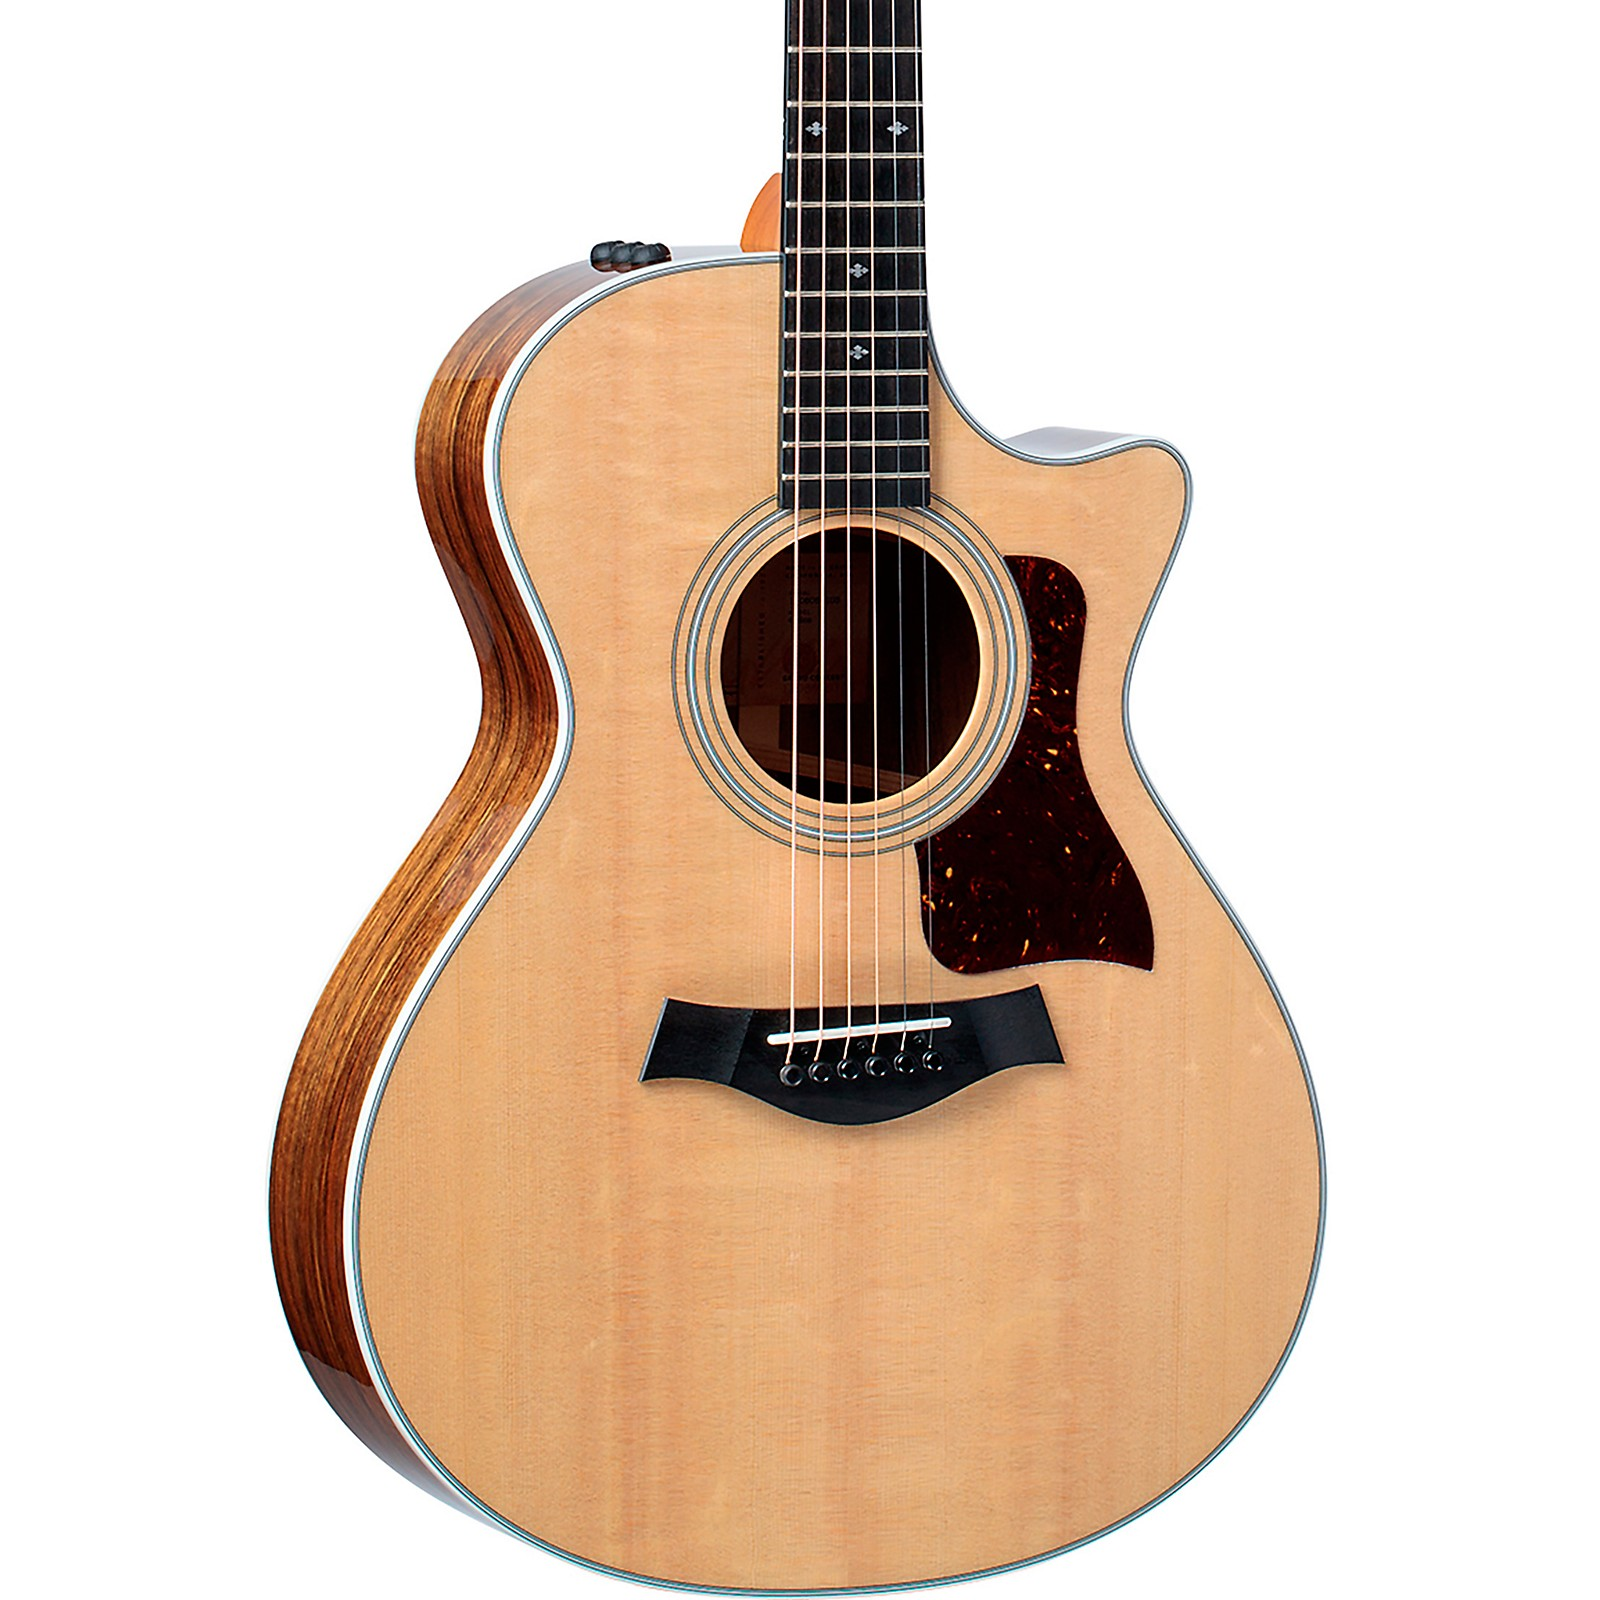 Taylor 412ce V-Class Grand Concert Acoustic-Electric Guitar